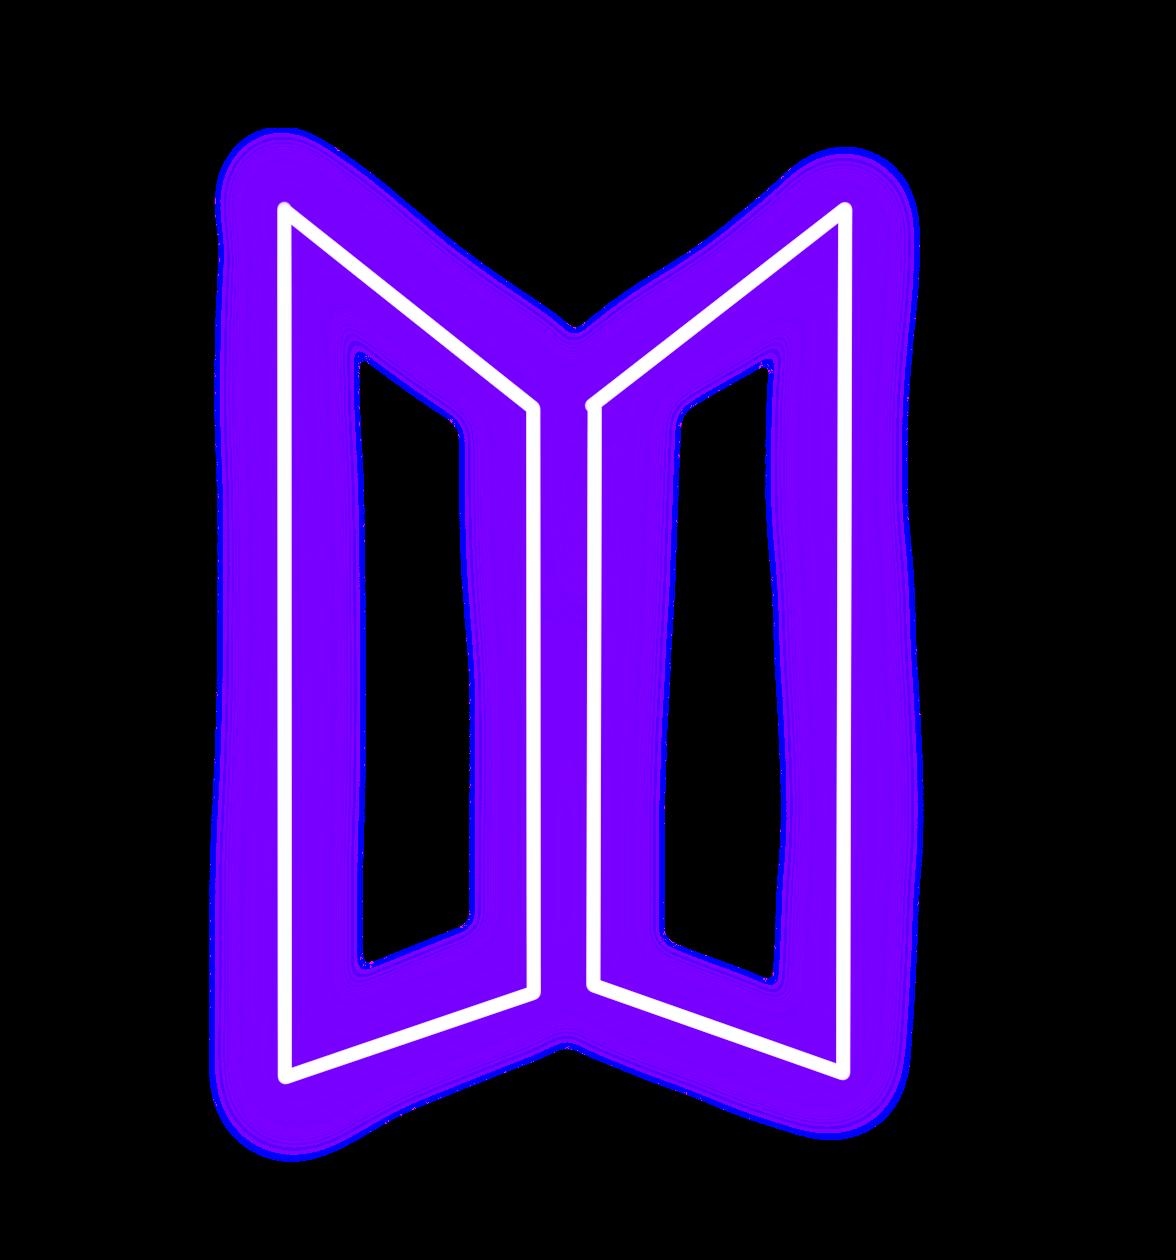 Bts Btslogo Kpop Kpoplogo Neon Purple Freetoedit Bts Backgrounds Image Stickers Neon Purple